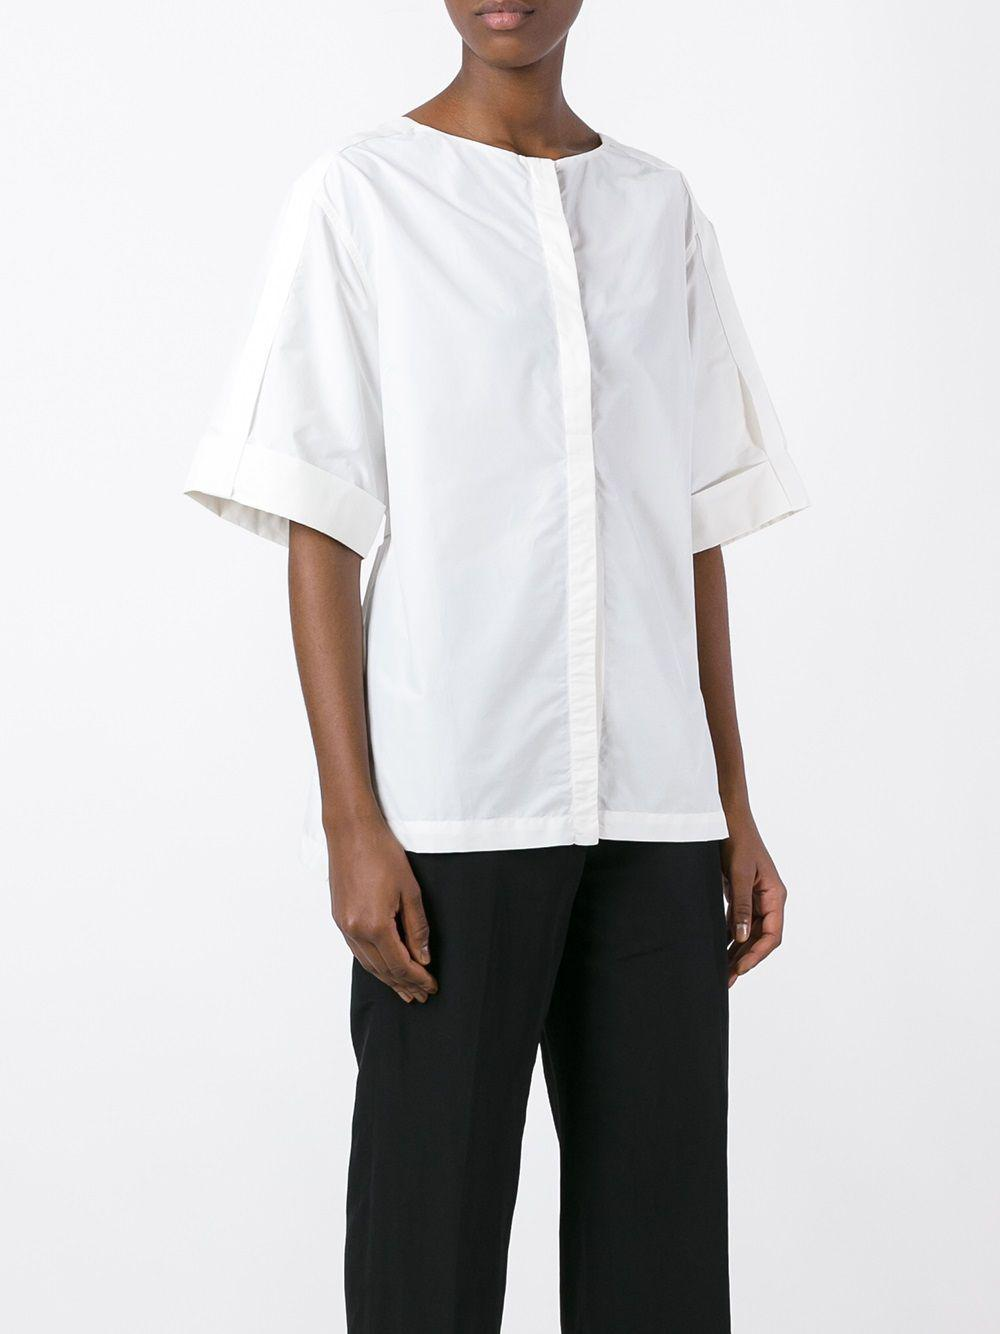 Christian Wijnants Cotton 'thais' Shirt in White